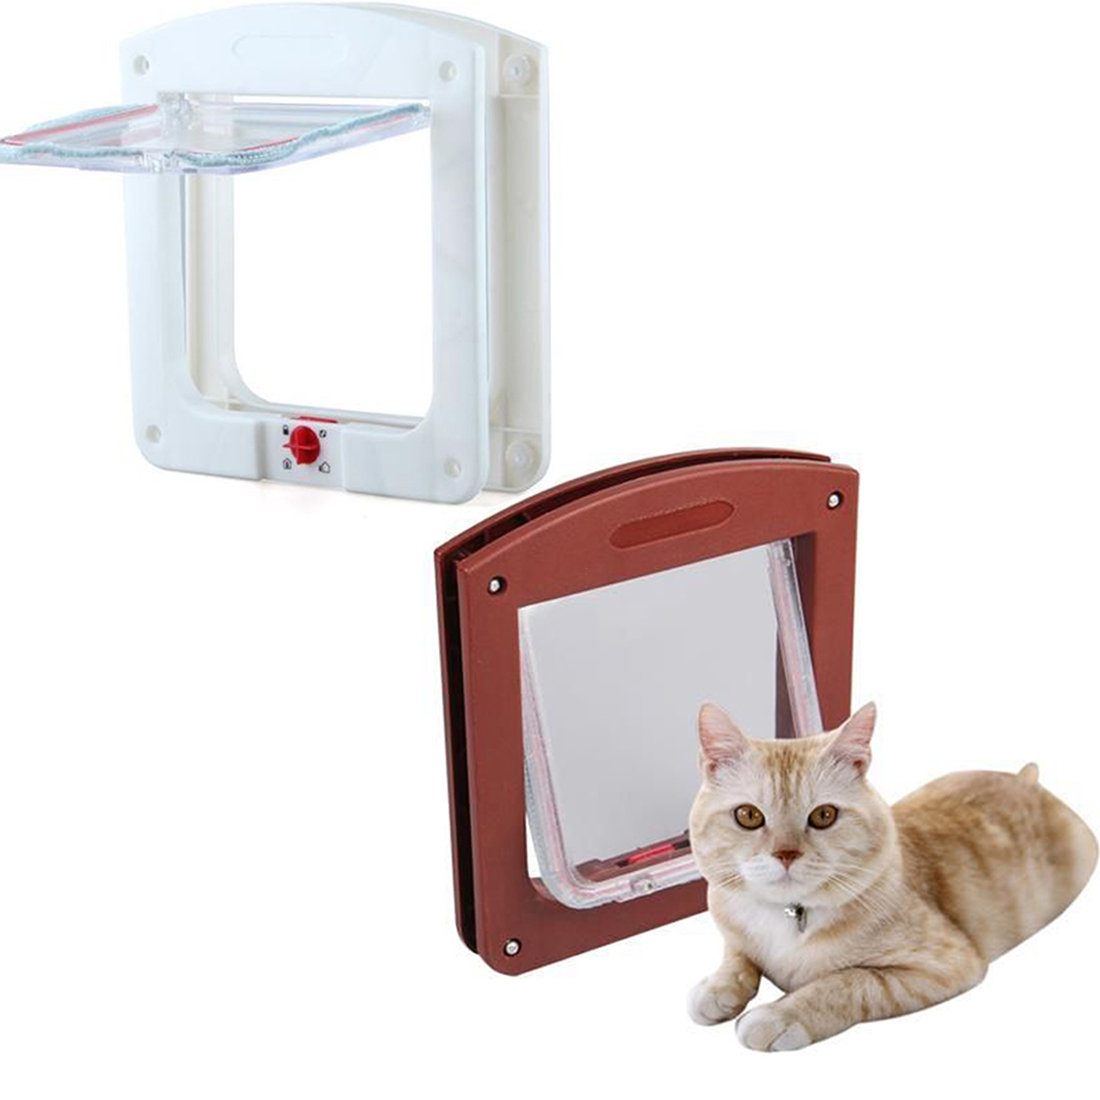 Free Shipping Hotsale Plastic 4 Way Cat Dog Small Pet Locking Door Flap Waterproof Durable